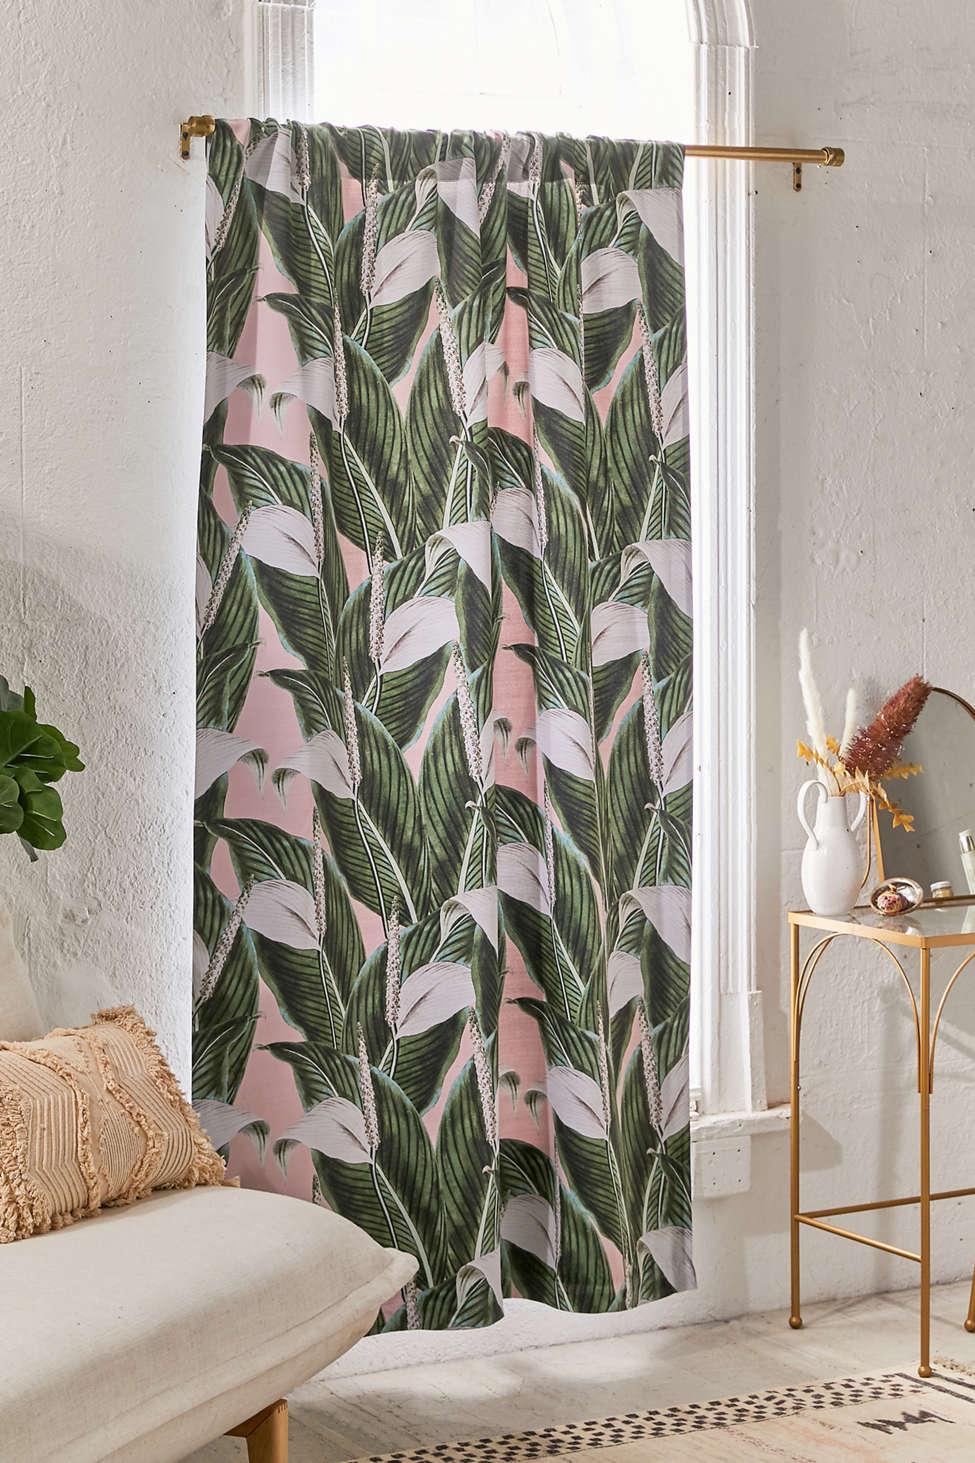 Slide View: 1: Marta Barragan For Deny Sweet Floral Room Darkening Window Panel